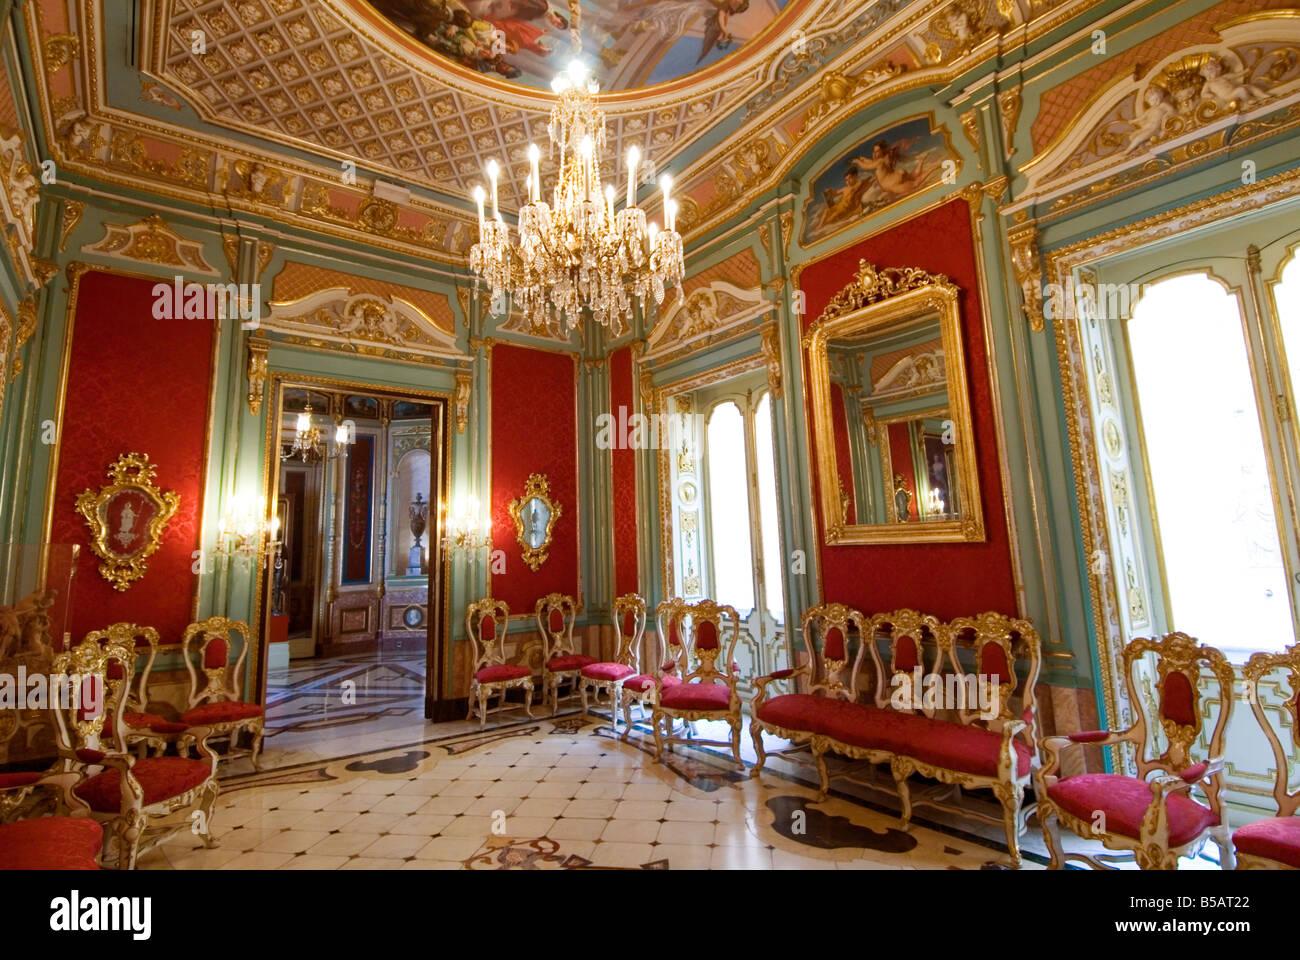 The Red Hall Sala Roja Inside The Palacio Del Marques De Dos Aguas Stock Phot...